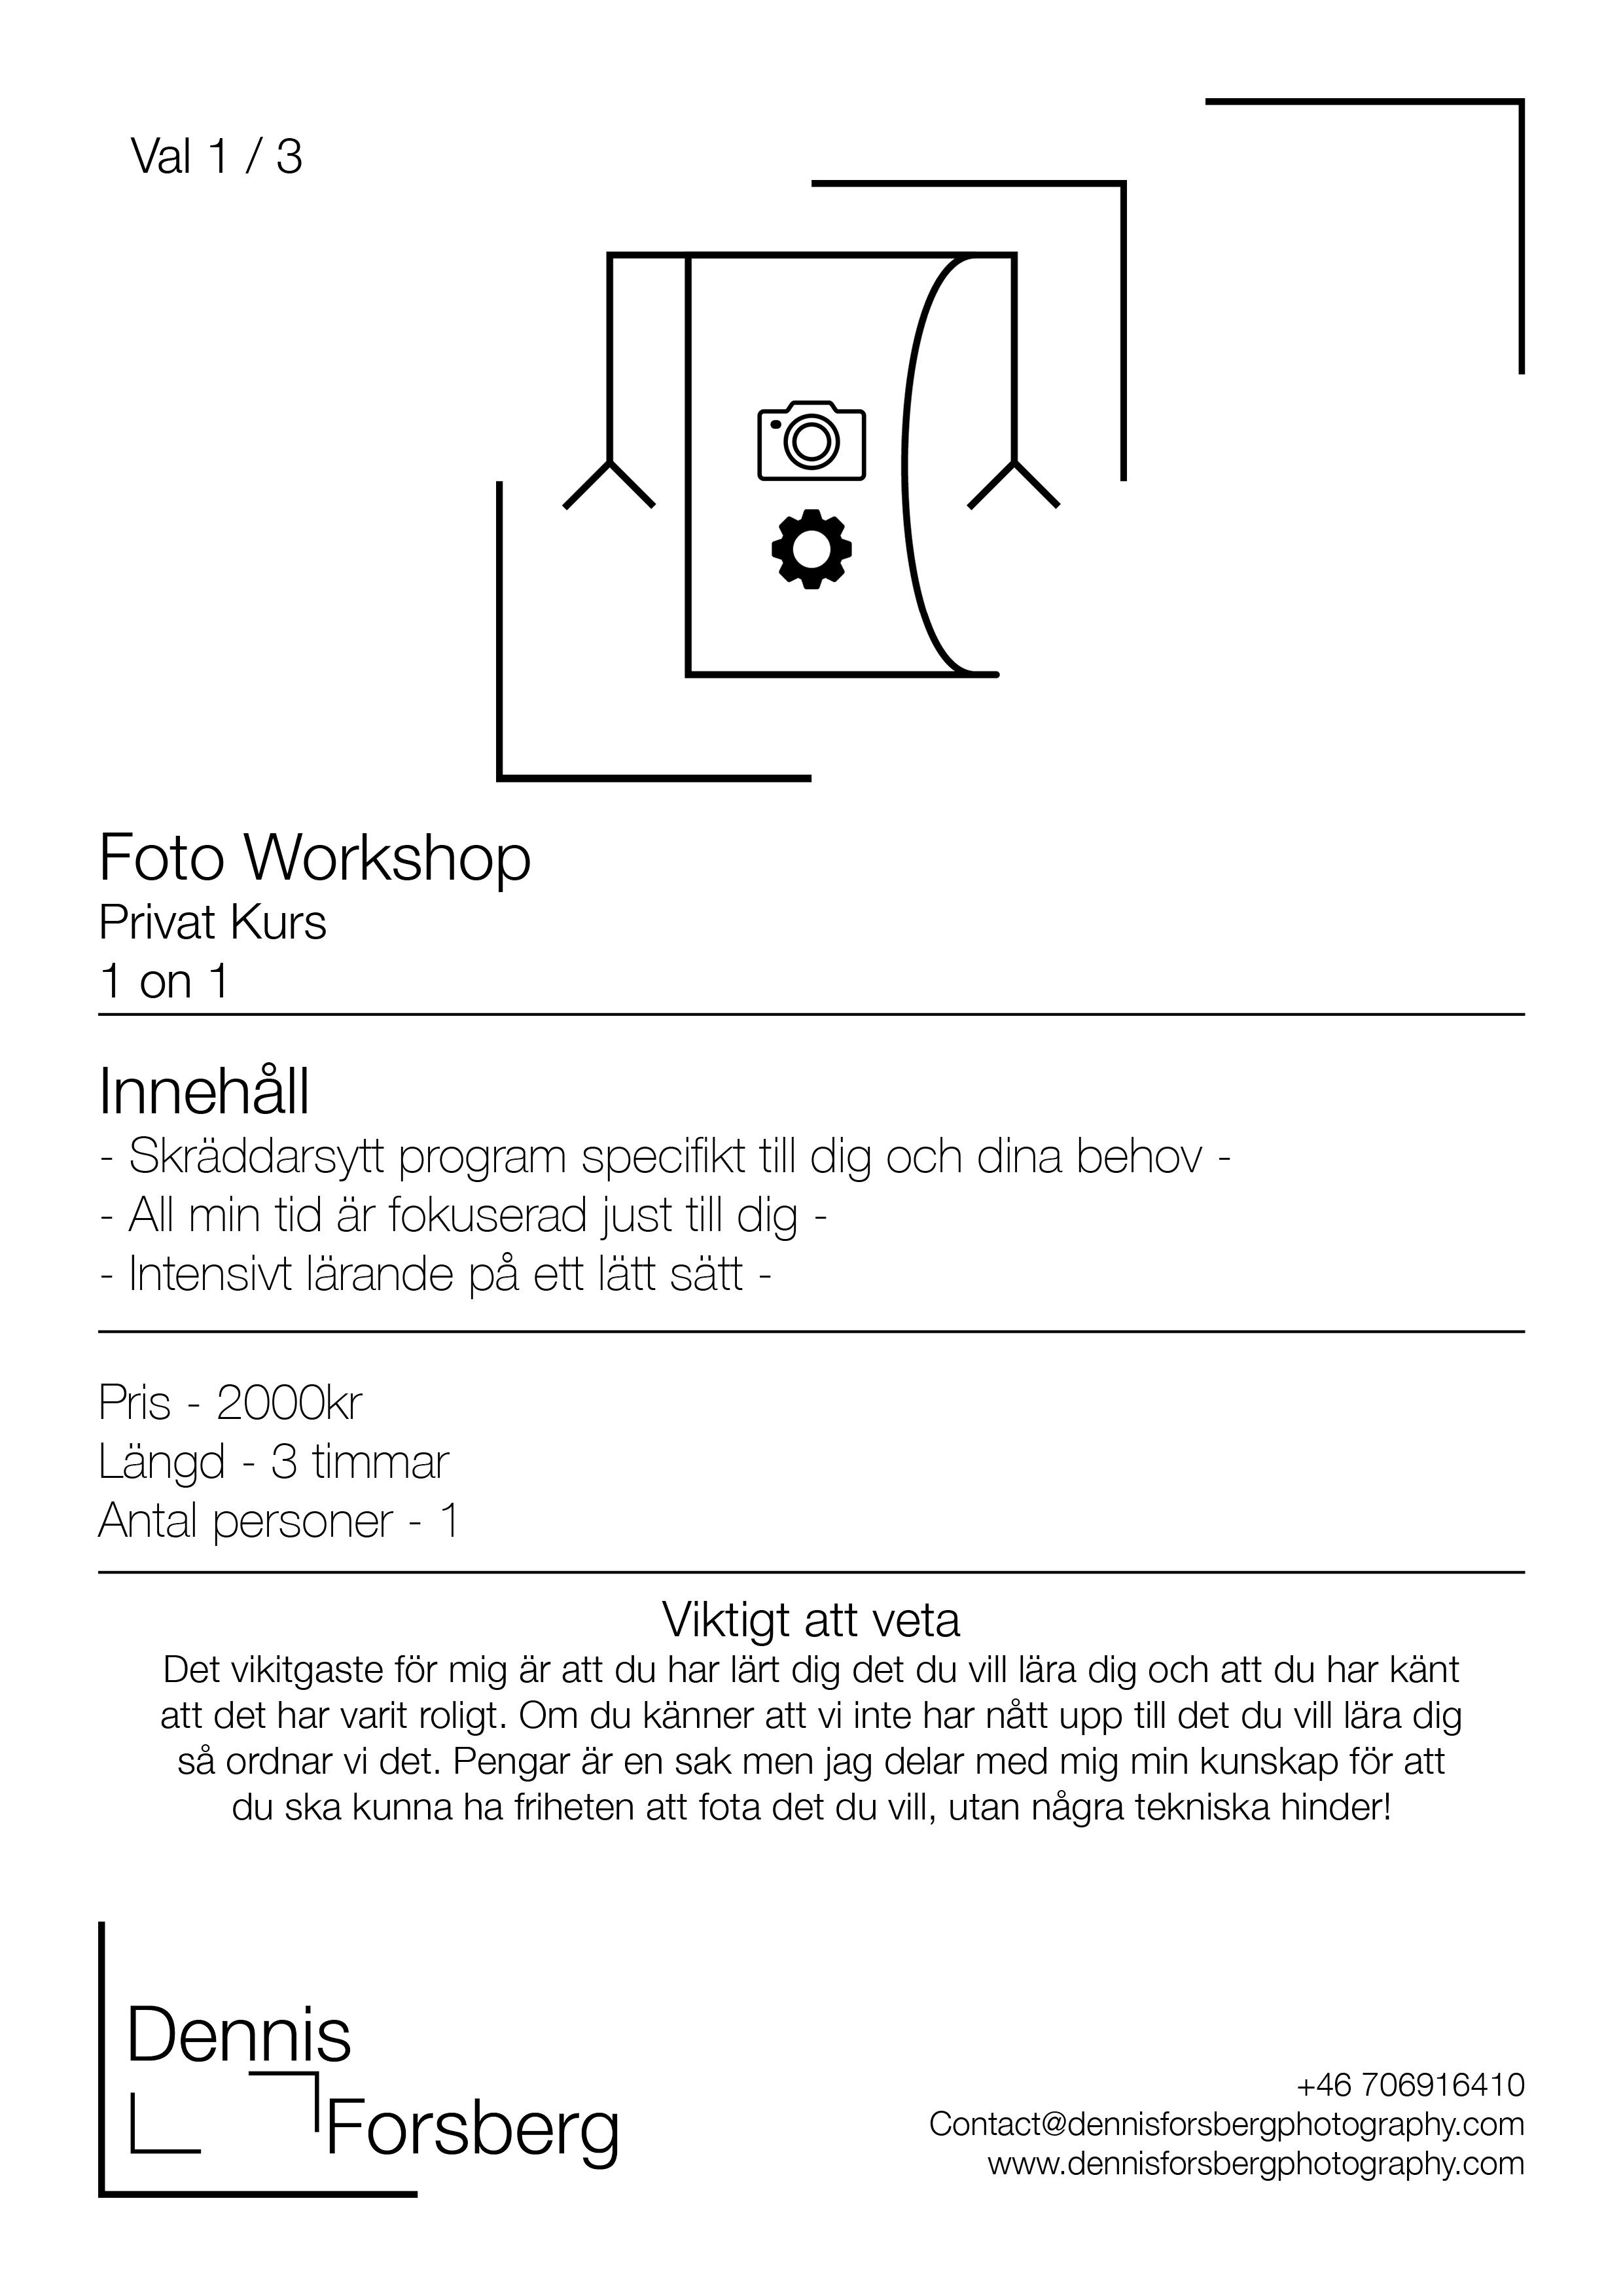 1:3Foto Workshop Privat Kurs.jpg